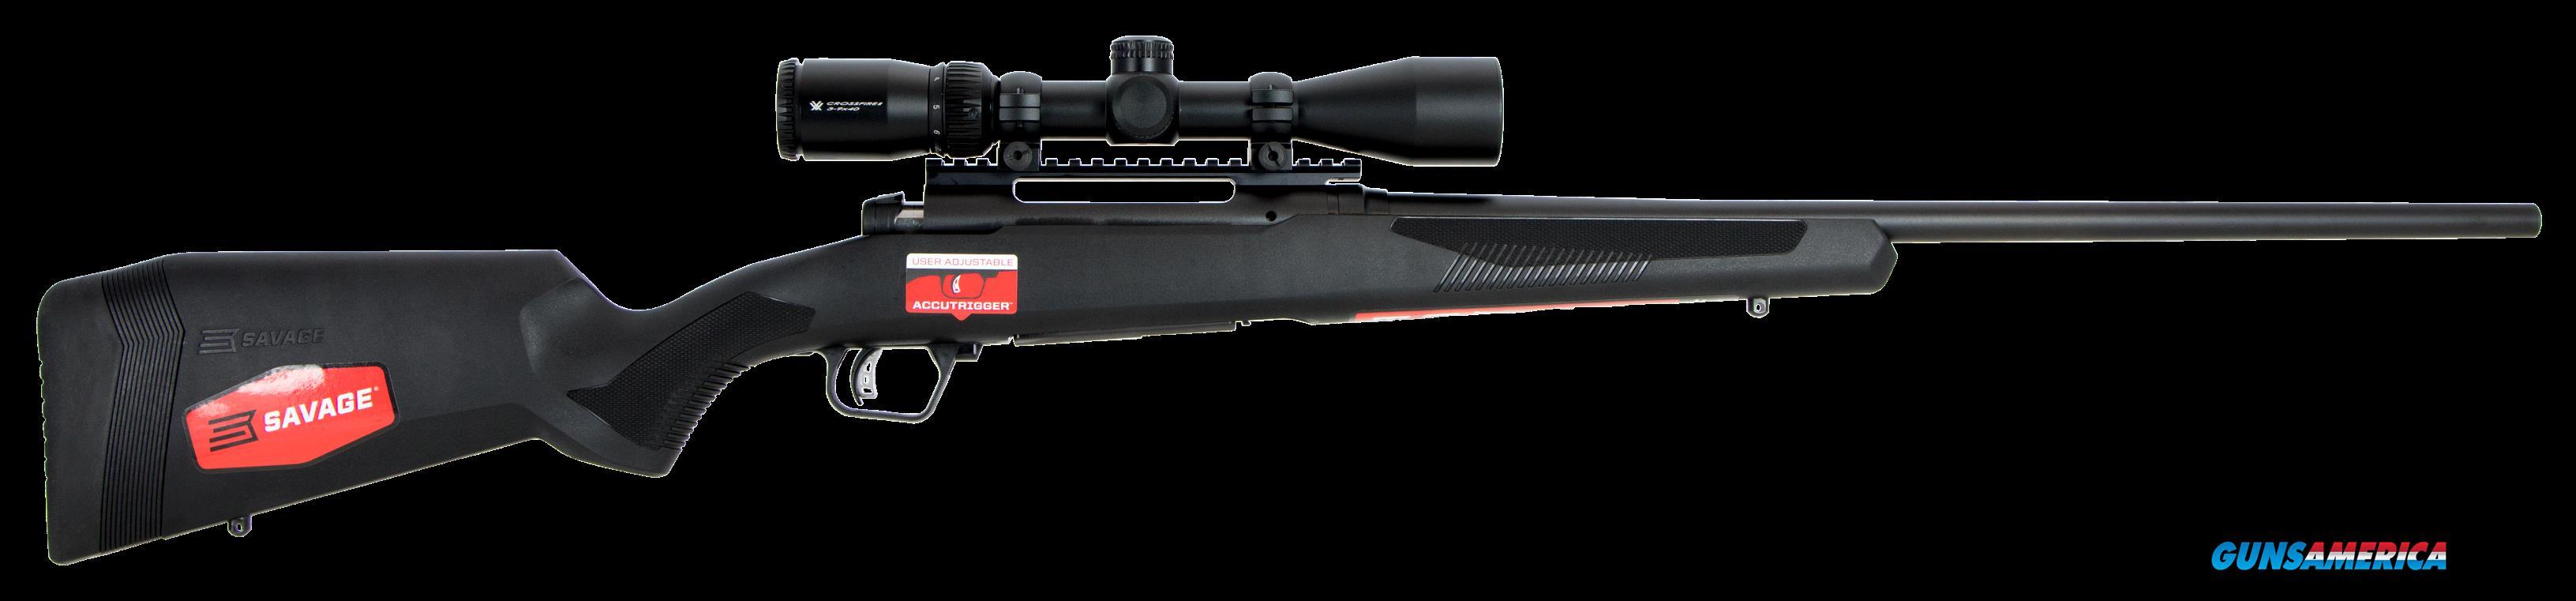 Savage 10-110, Sav 57322 110 Apex Hunter Xp 308 Win   Lh   Vortex  Guns > Pistols > 1911 Pistol Copies (non-Colt)